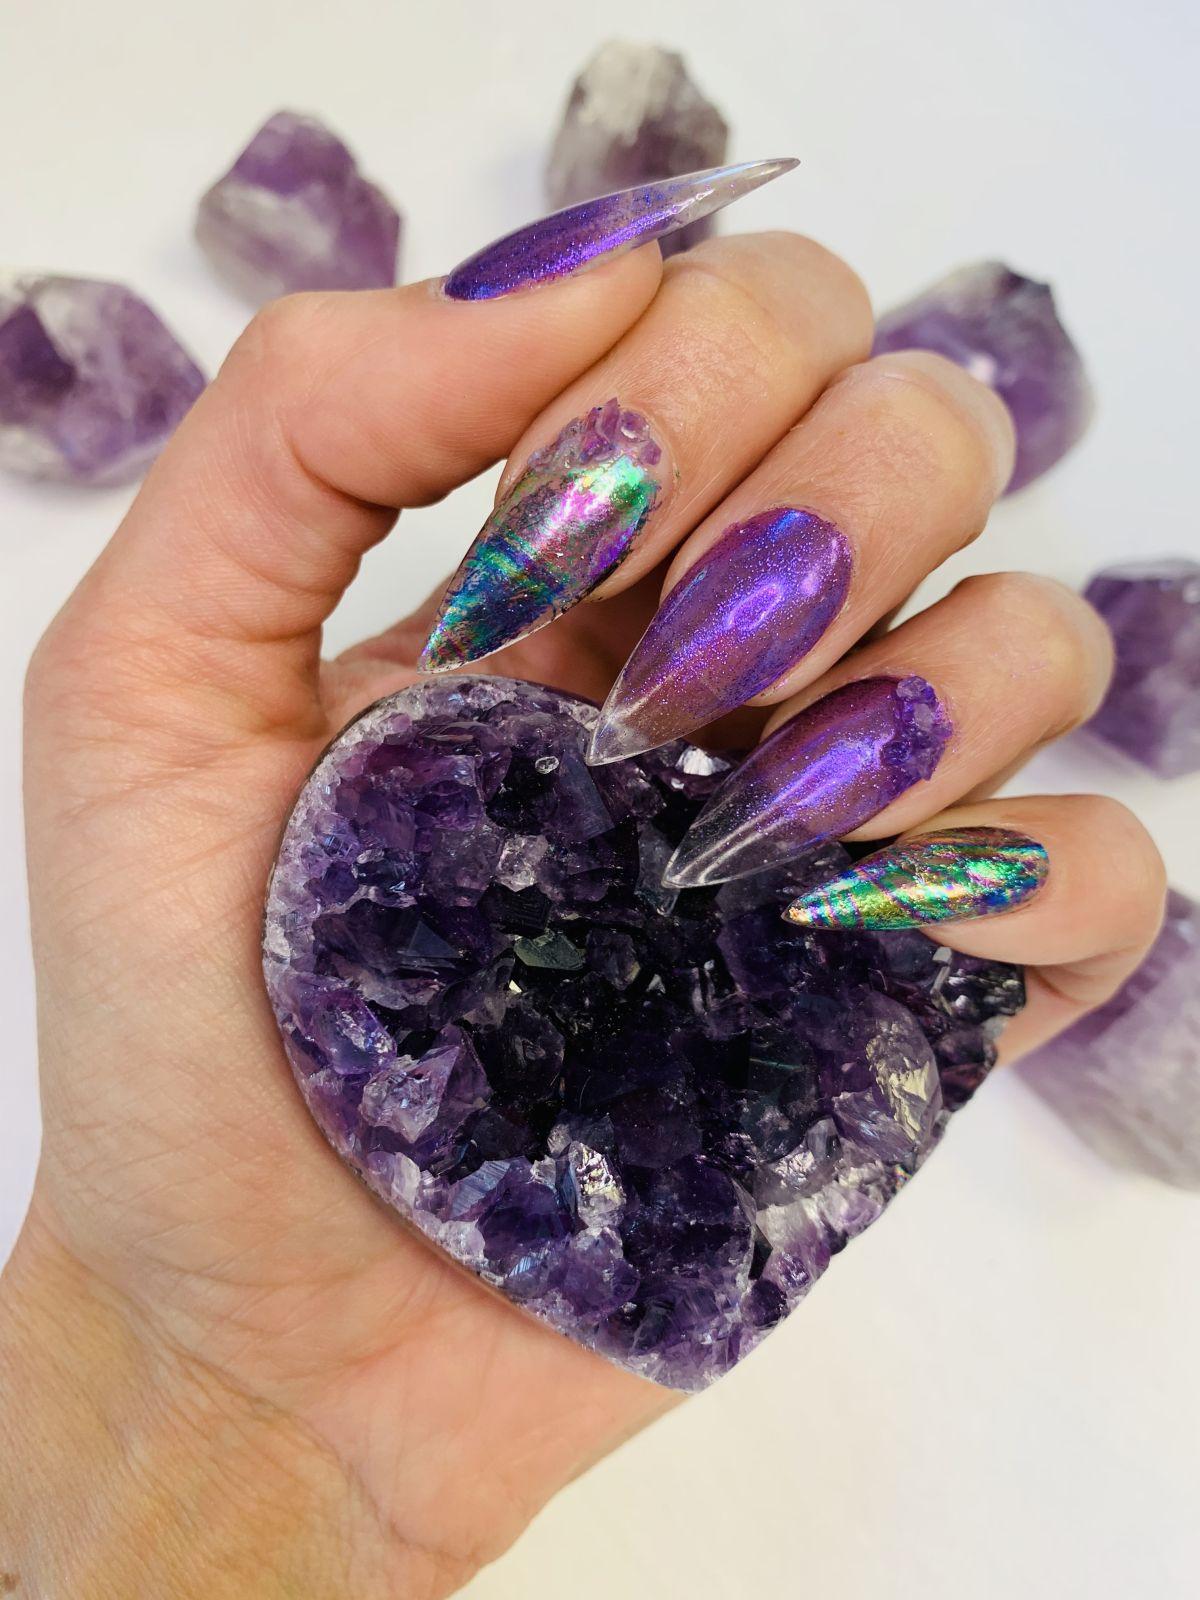 Add Genuine Crystal Gemstones to Nail Art